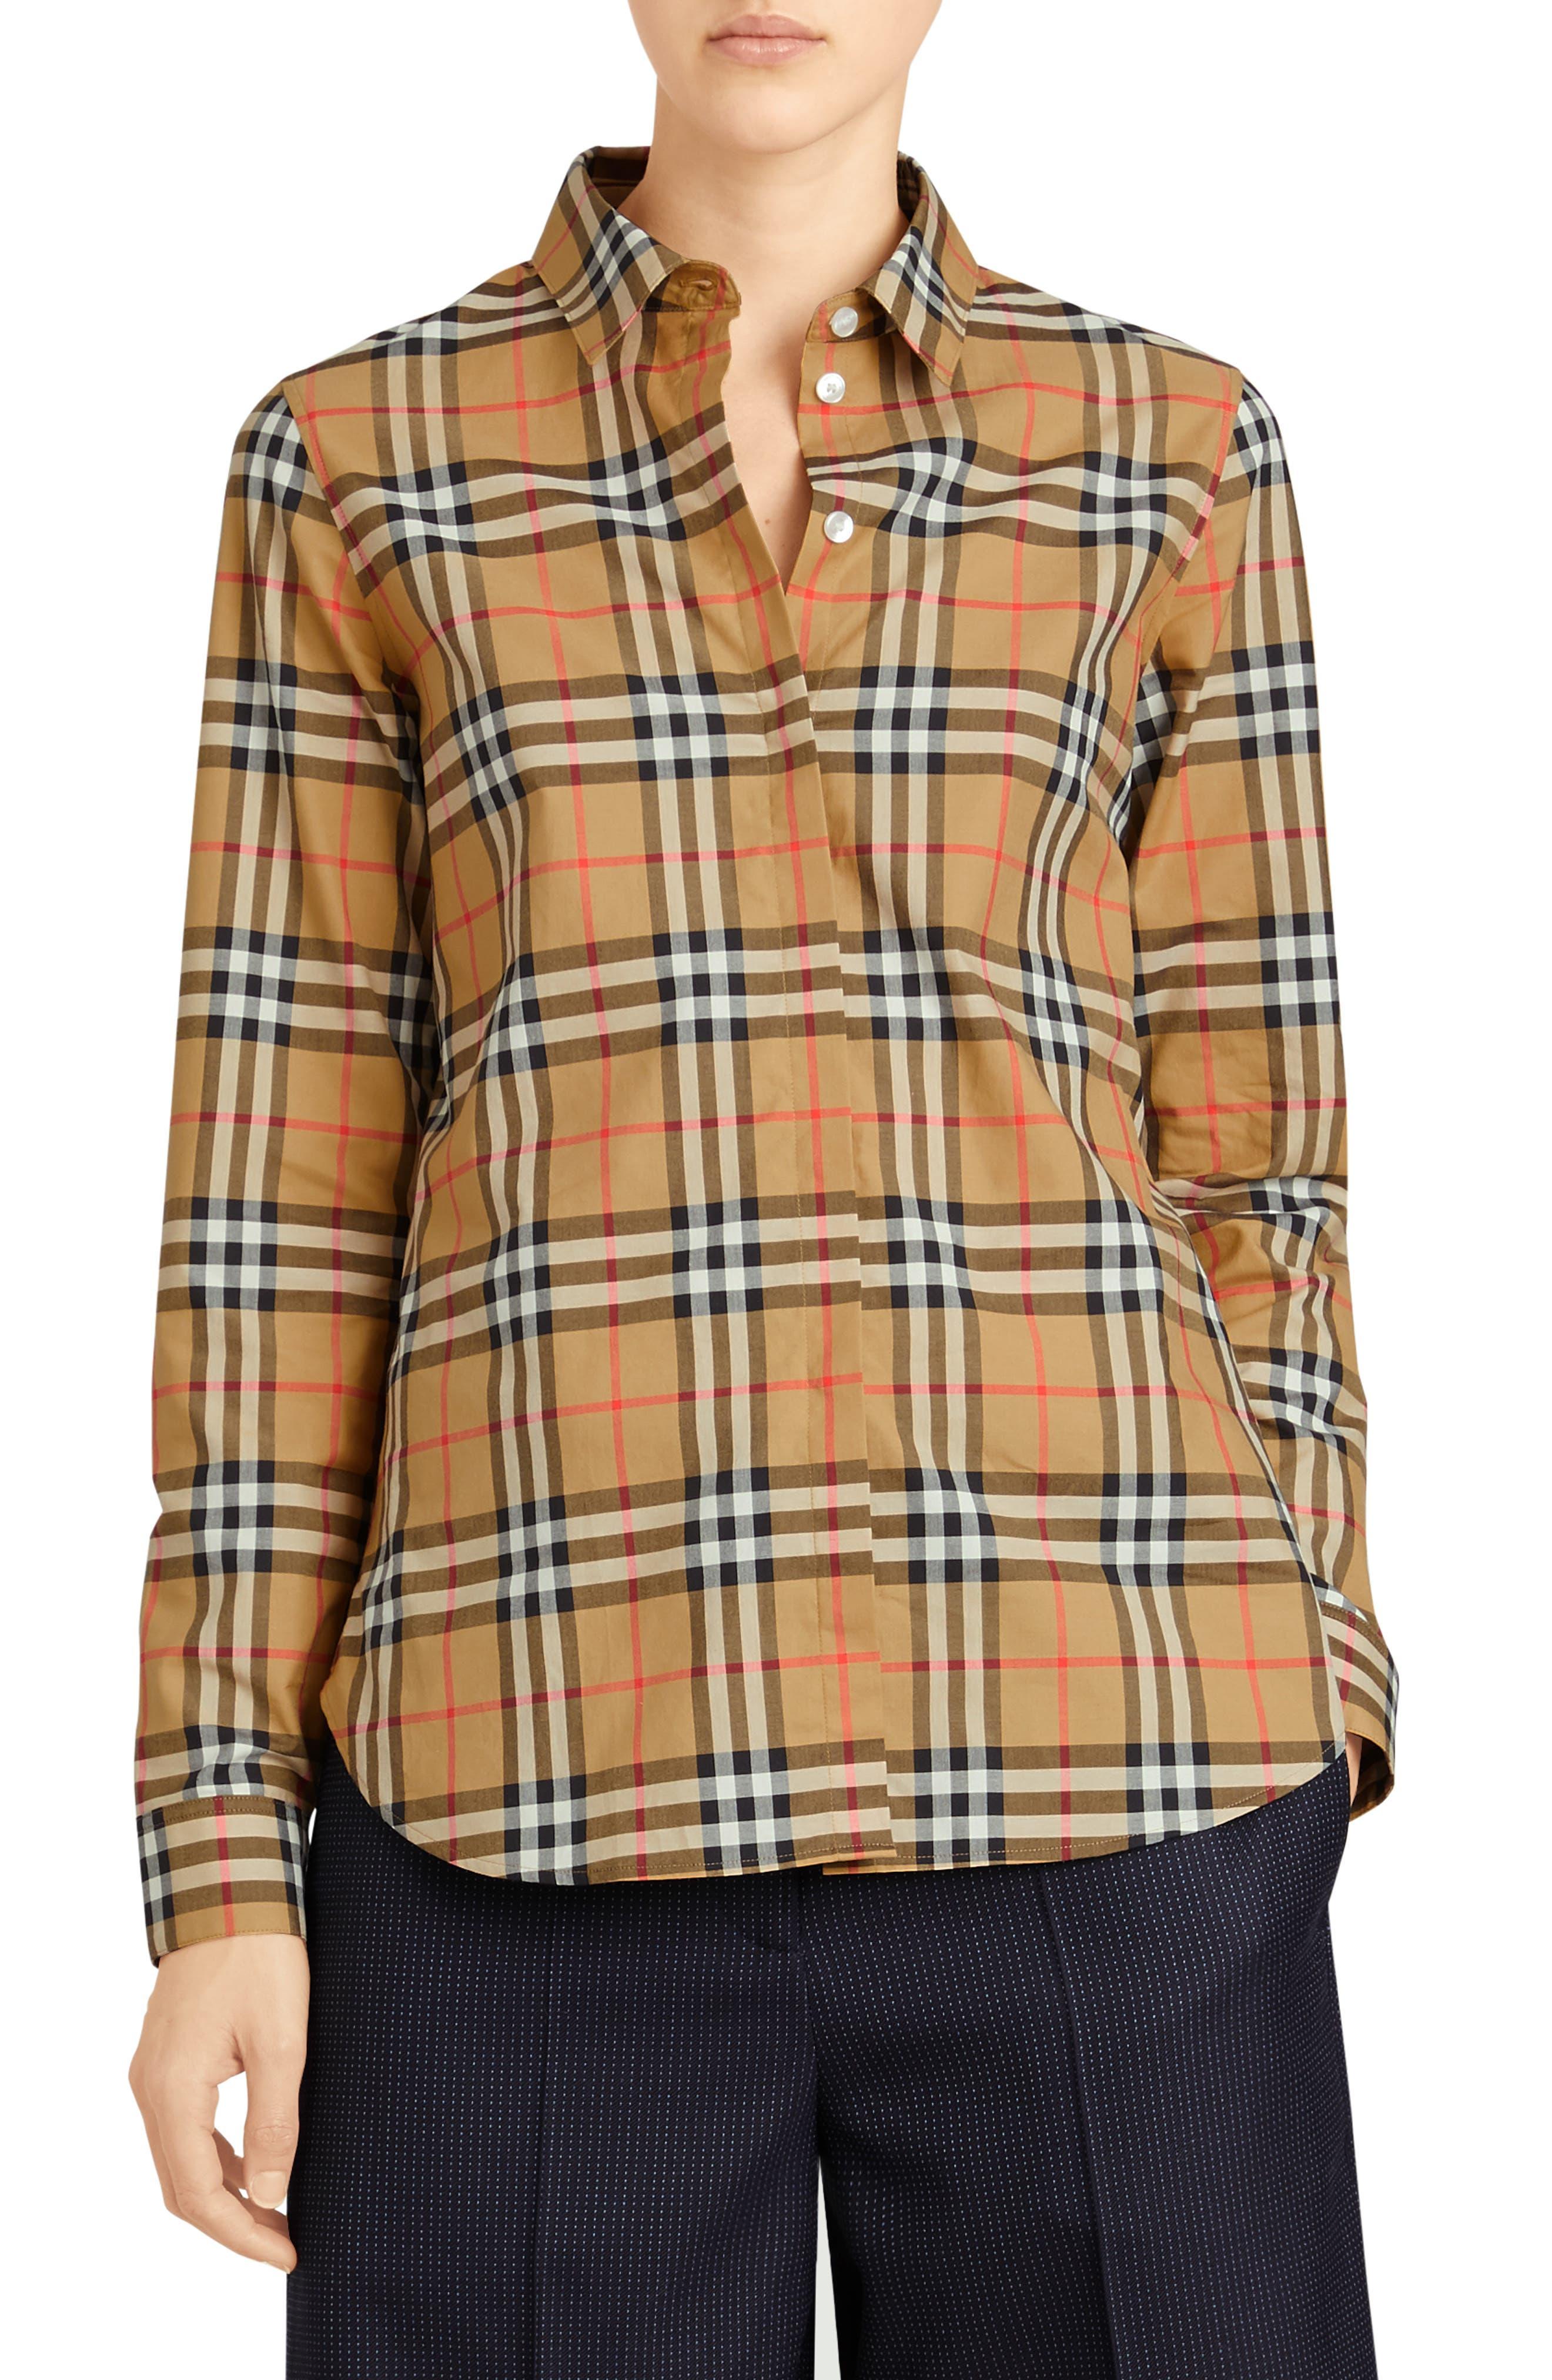 Crow Vintage Check Shirt,                         Main,                         color, ANTIQUE YELLOW CHECK